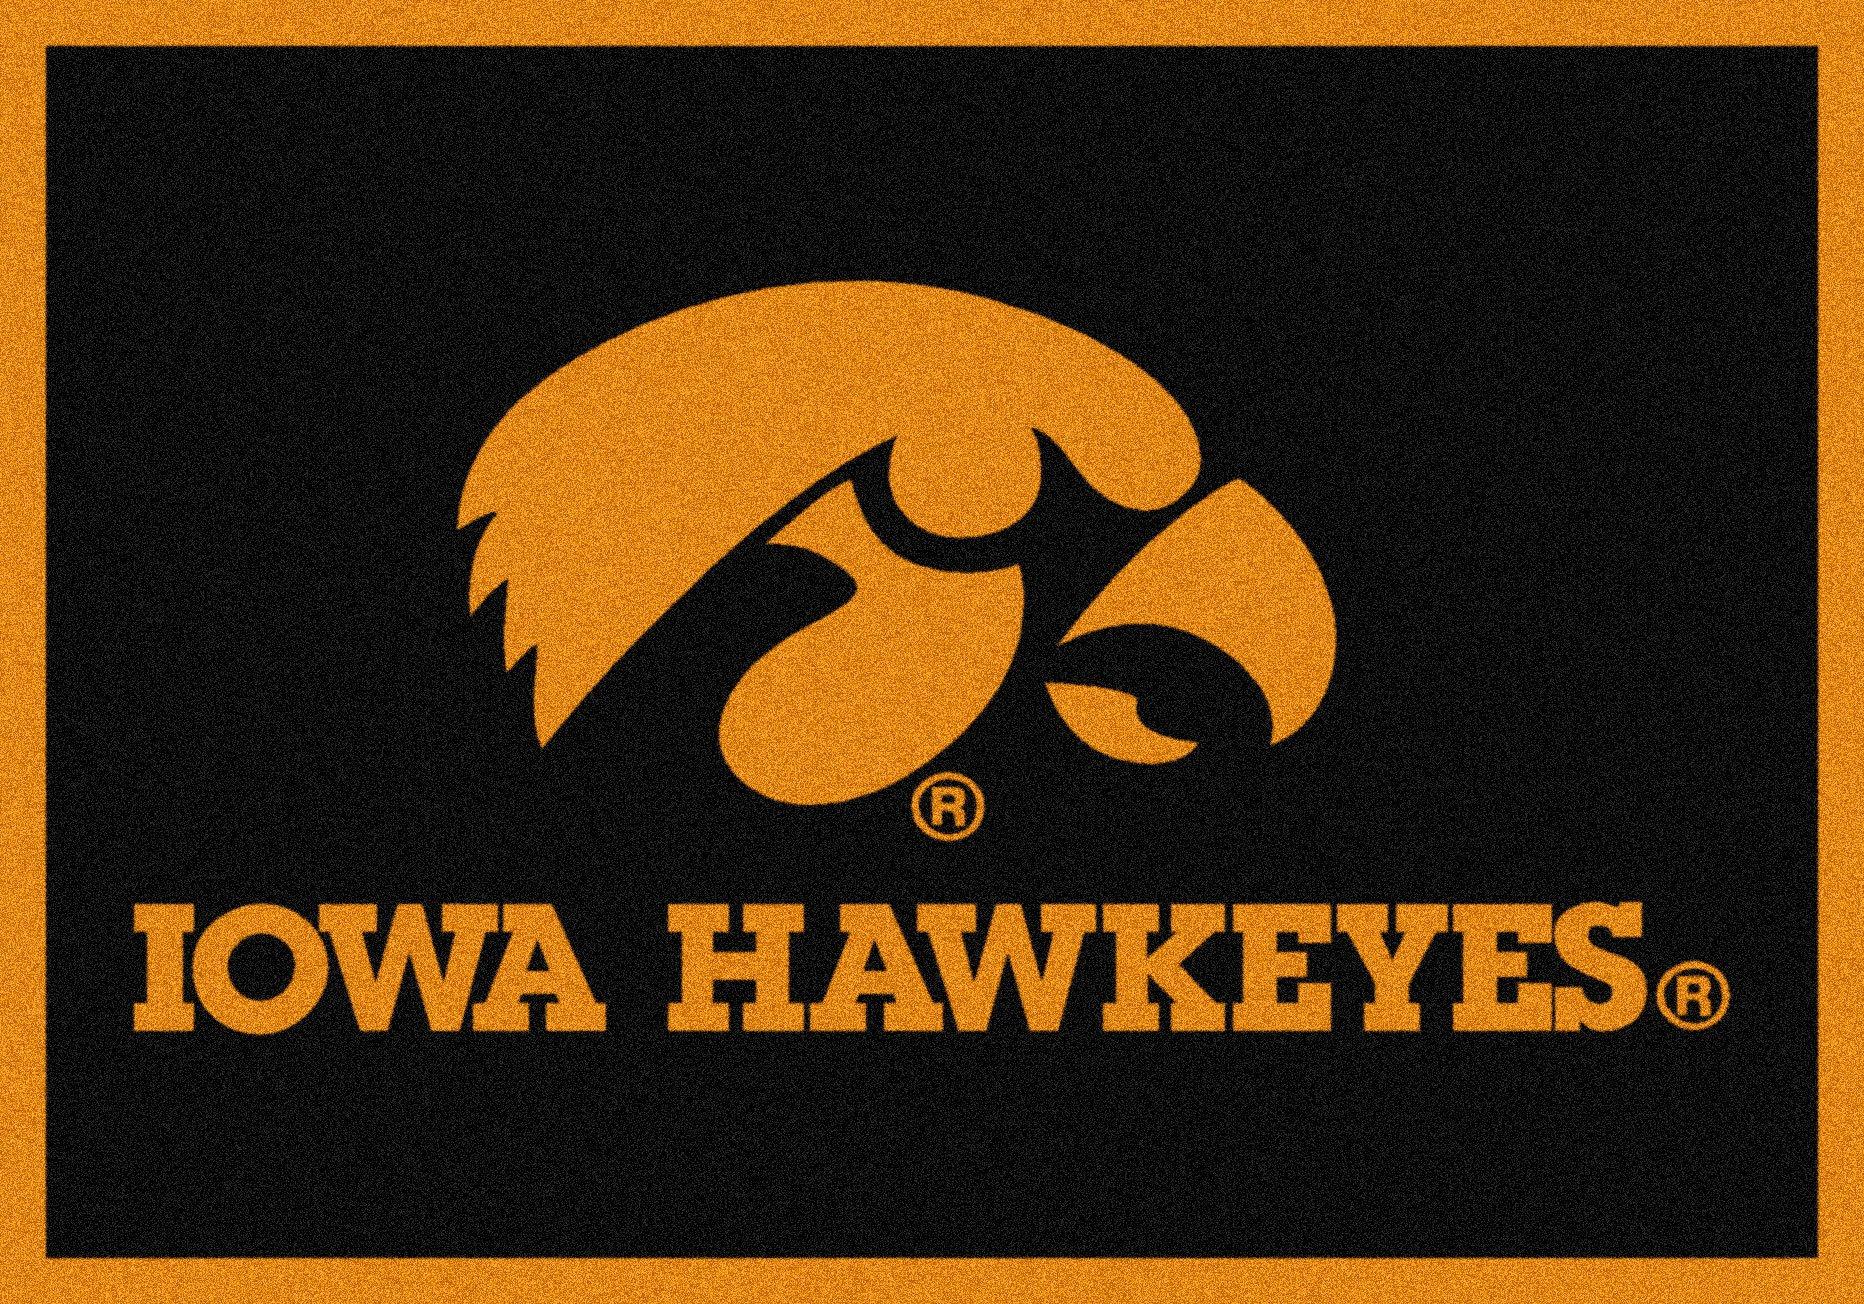 Iowa Hawkeyes NCAA College Team Spirit Team Area Rug 2'8''x3'10''